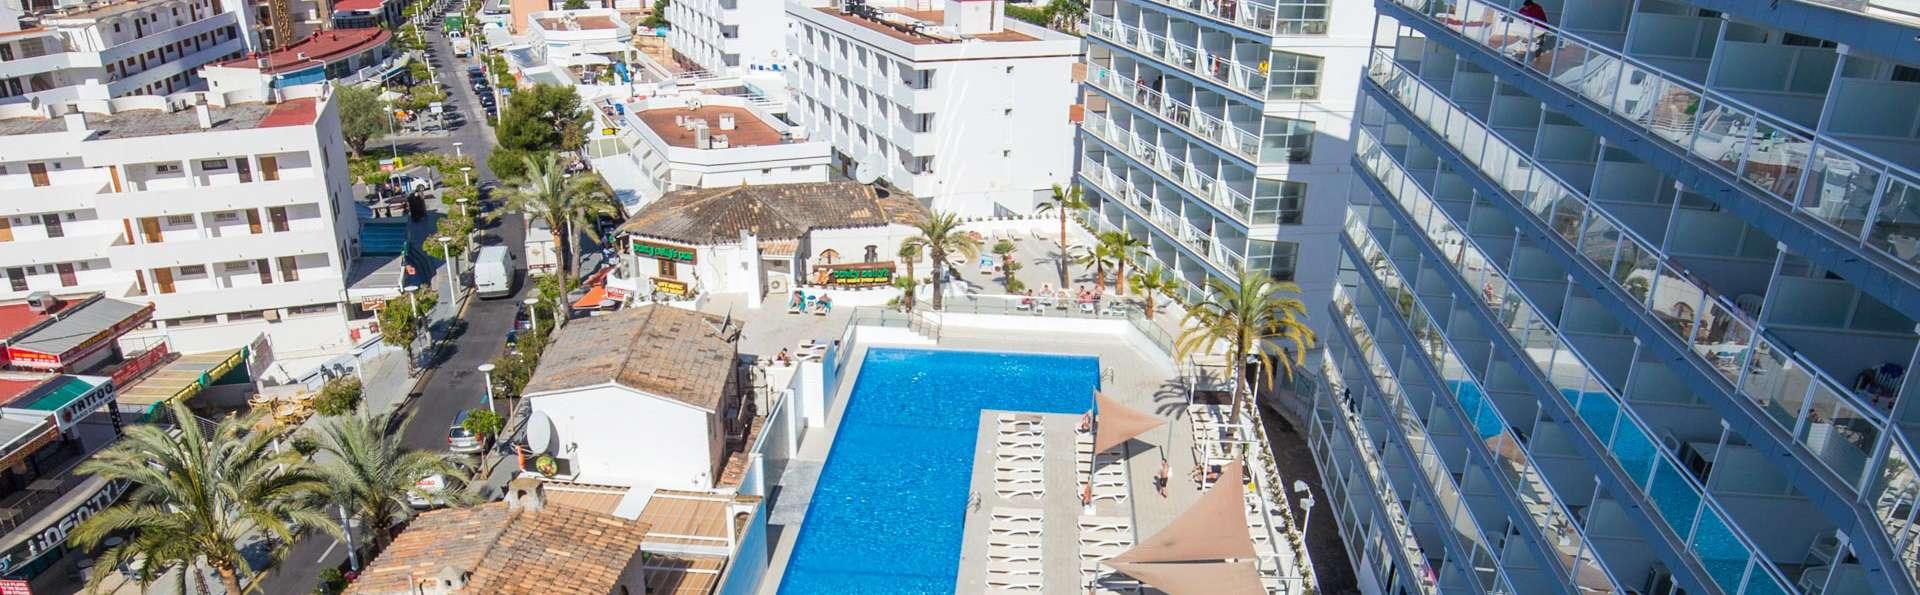 Pierre & Vacances Mallorca Deya - EDIT_POOL_01.jpg